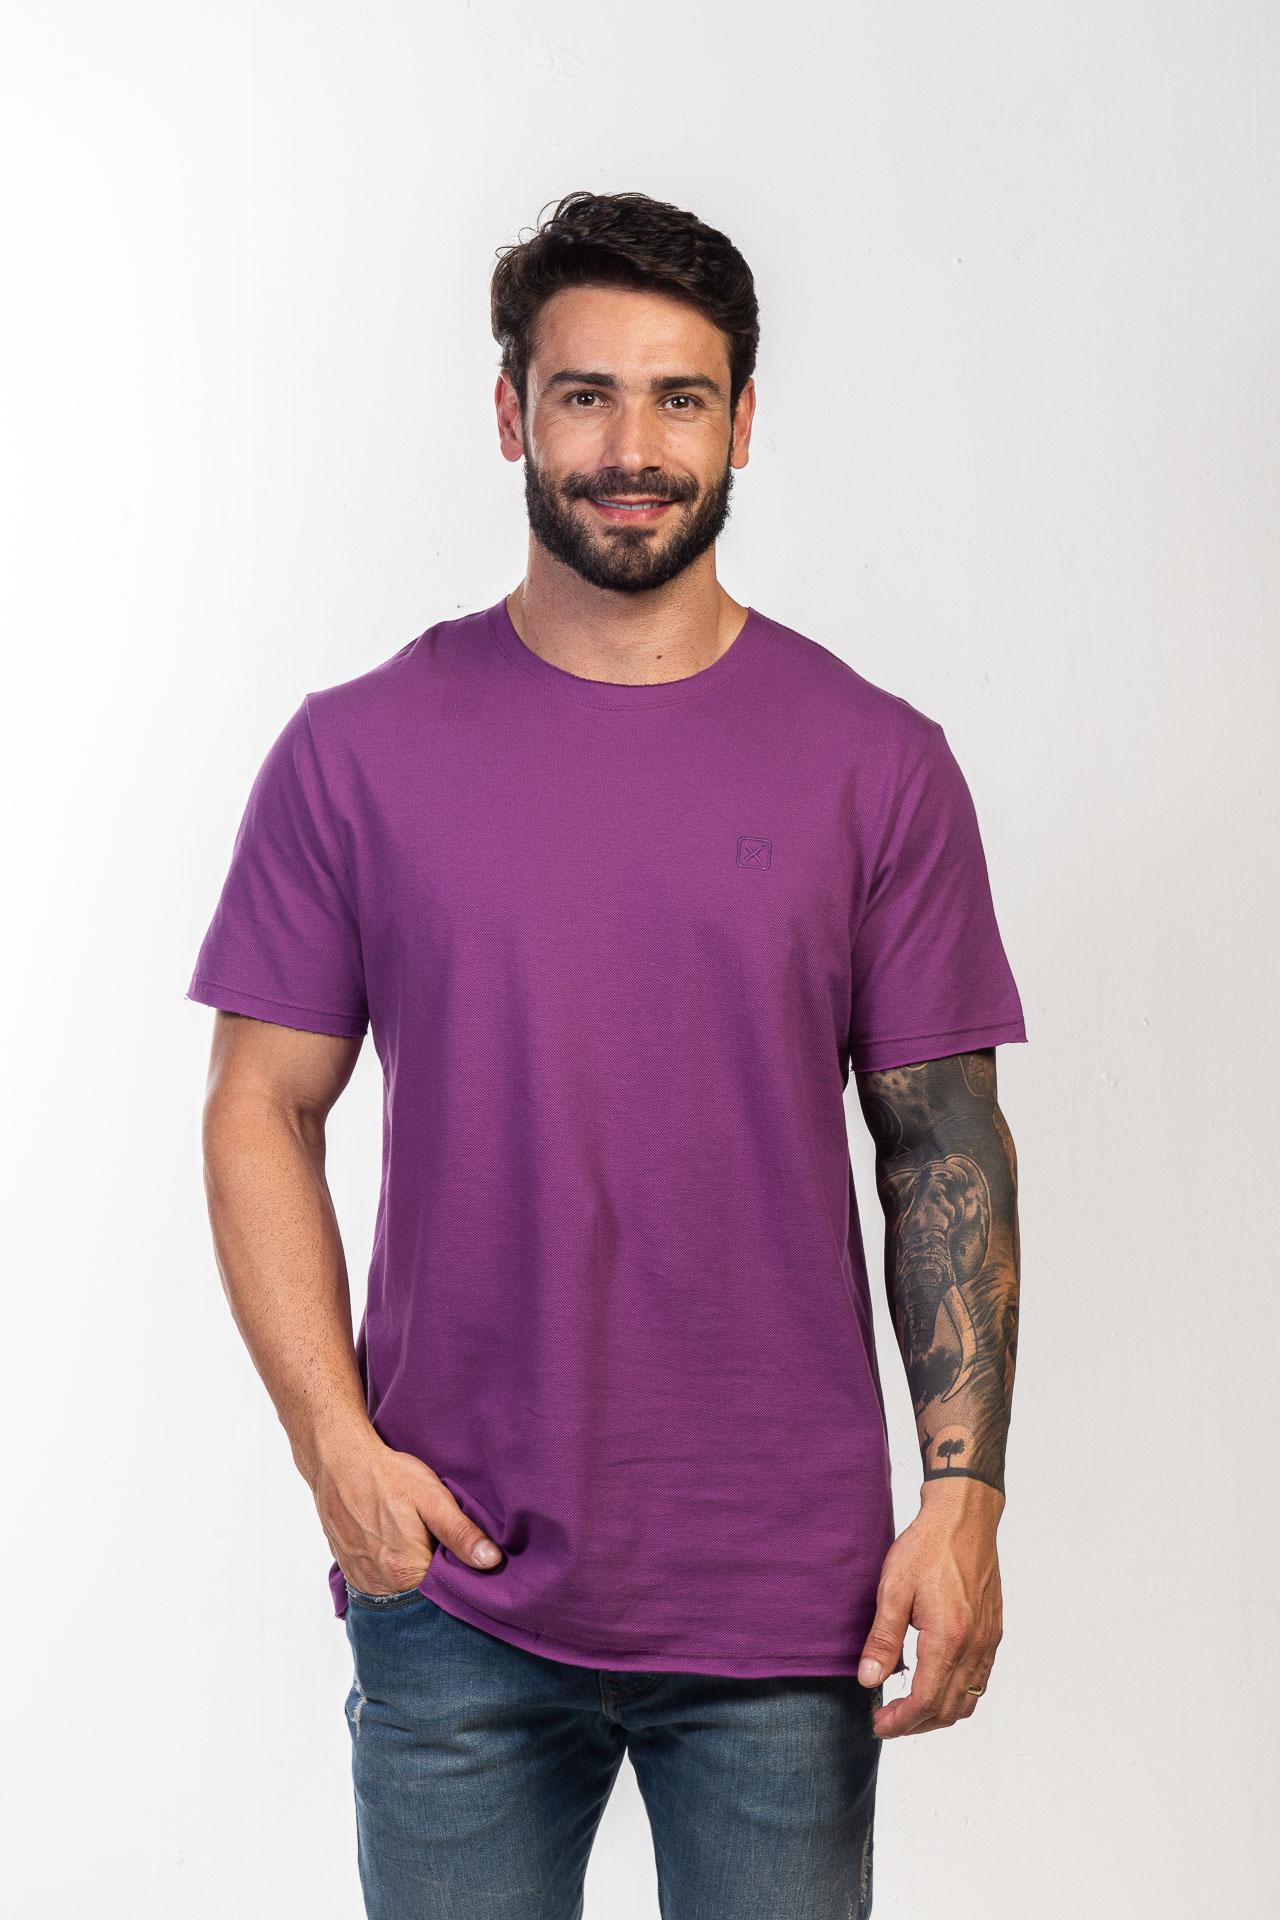 Camiseta Masculina TXC 19581